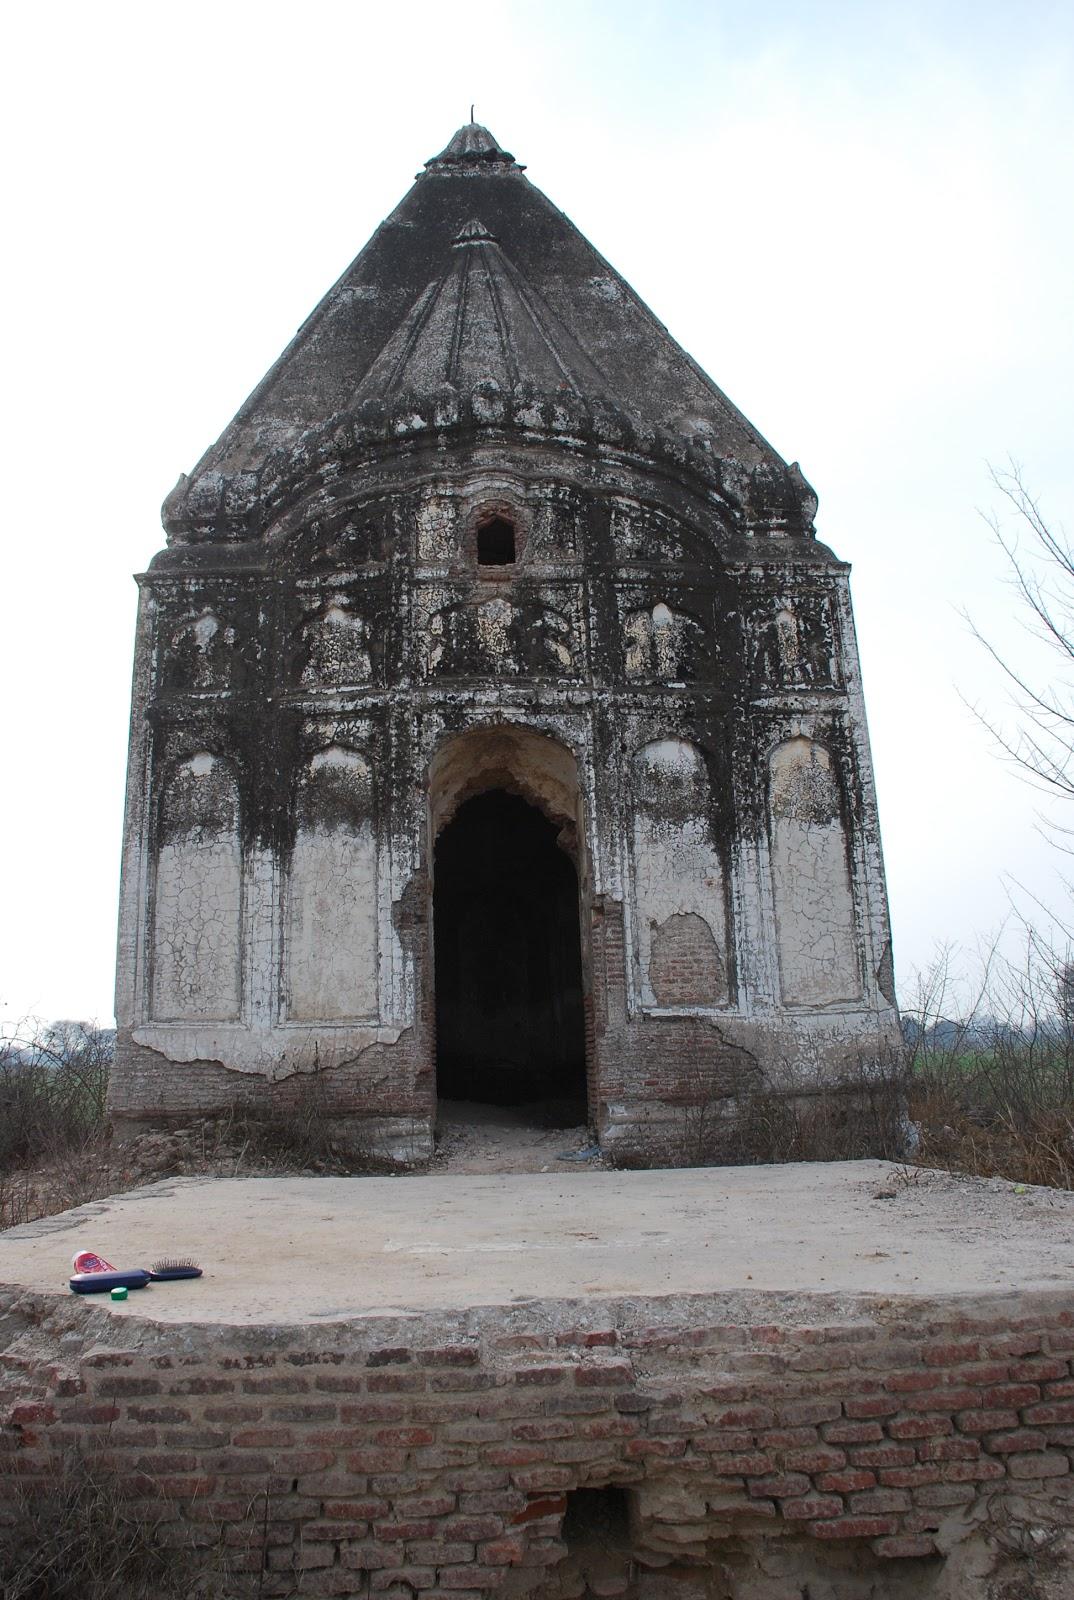 Hindu temple in Beowali, Gujrat, Pakistan